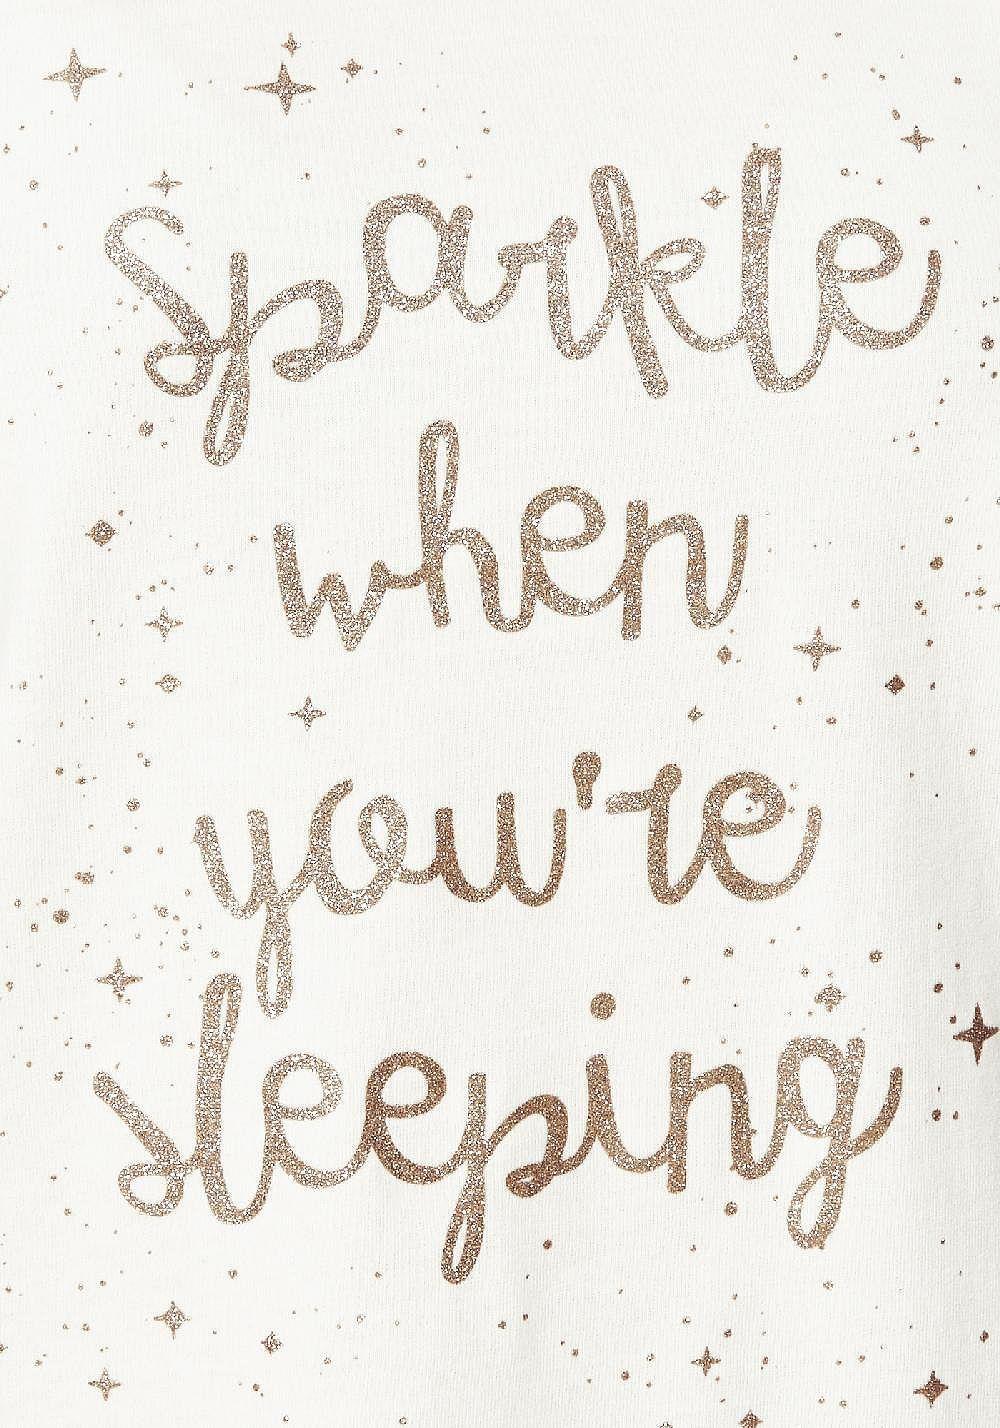 Tesco direct: F&F Sparkle Slogan Pyjamas | Decor & print